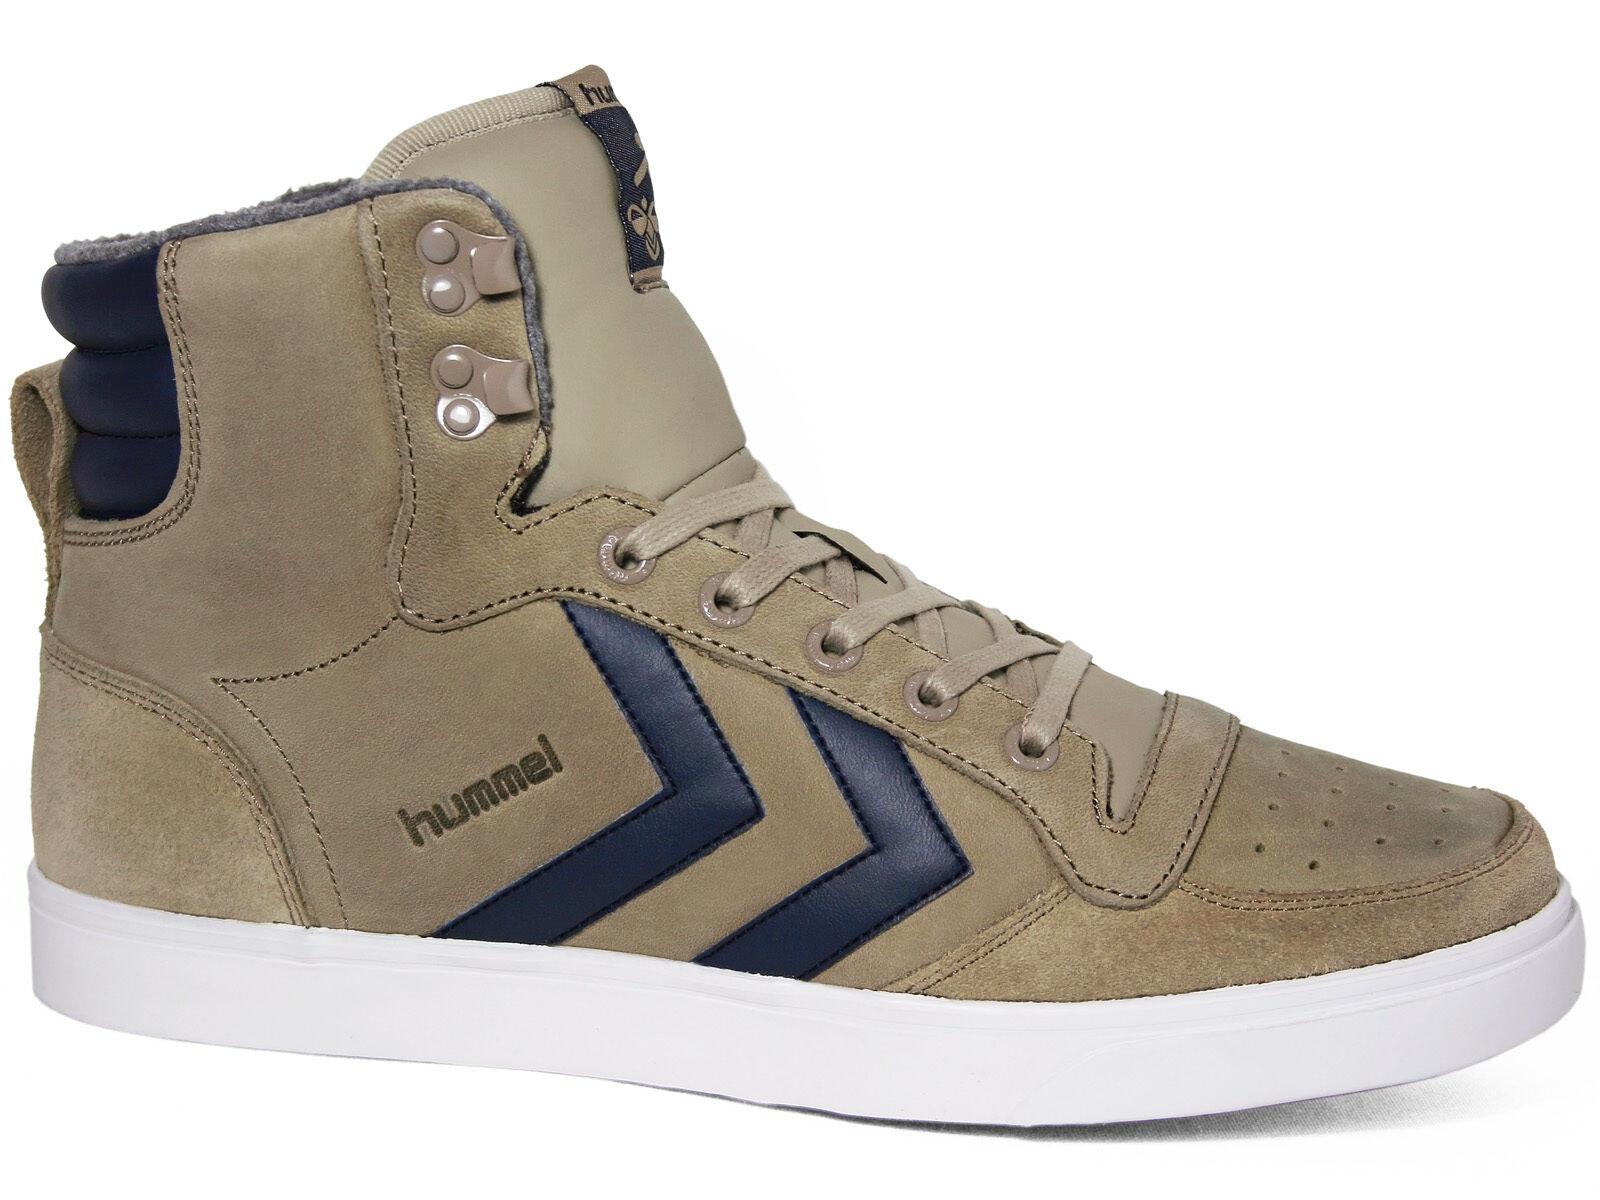 Hummel Stadil Winter Sneaker Leather High Chinchilla Hellbraun 64-180-1515 Leder